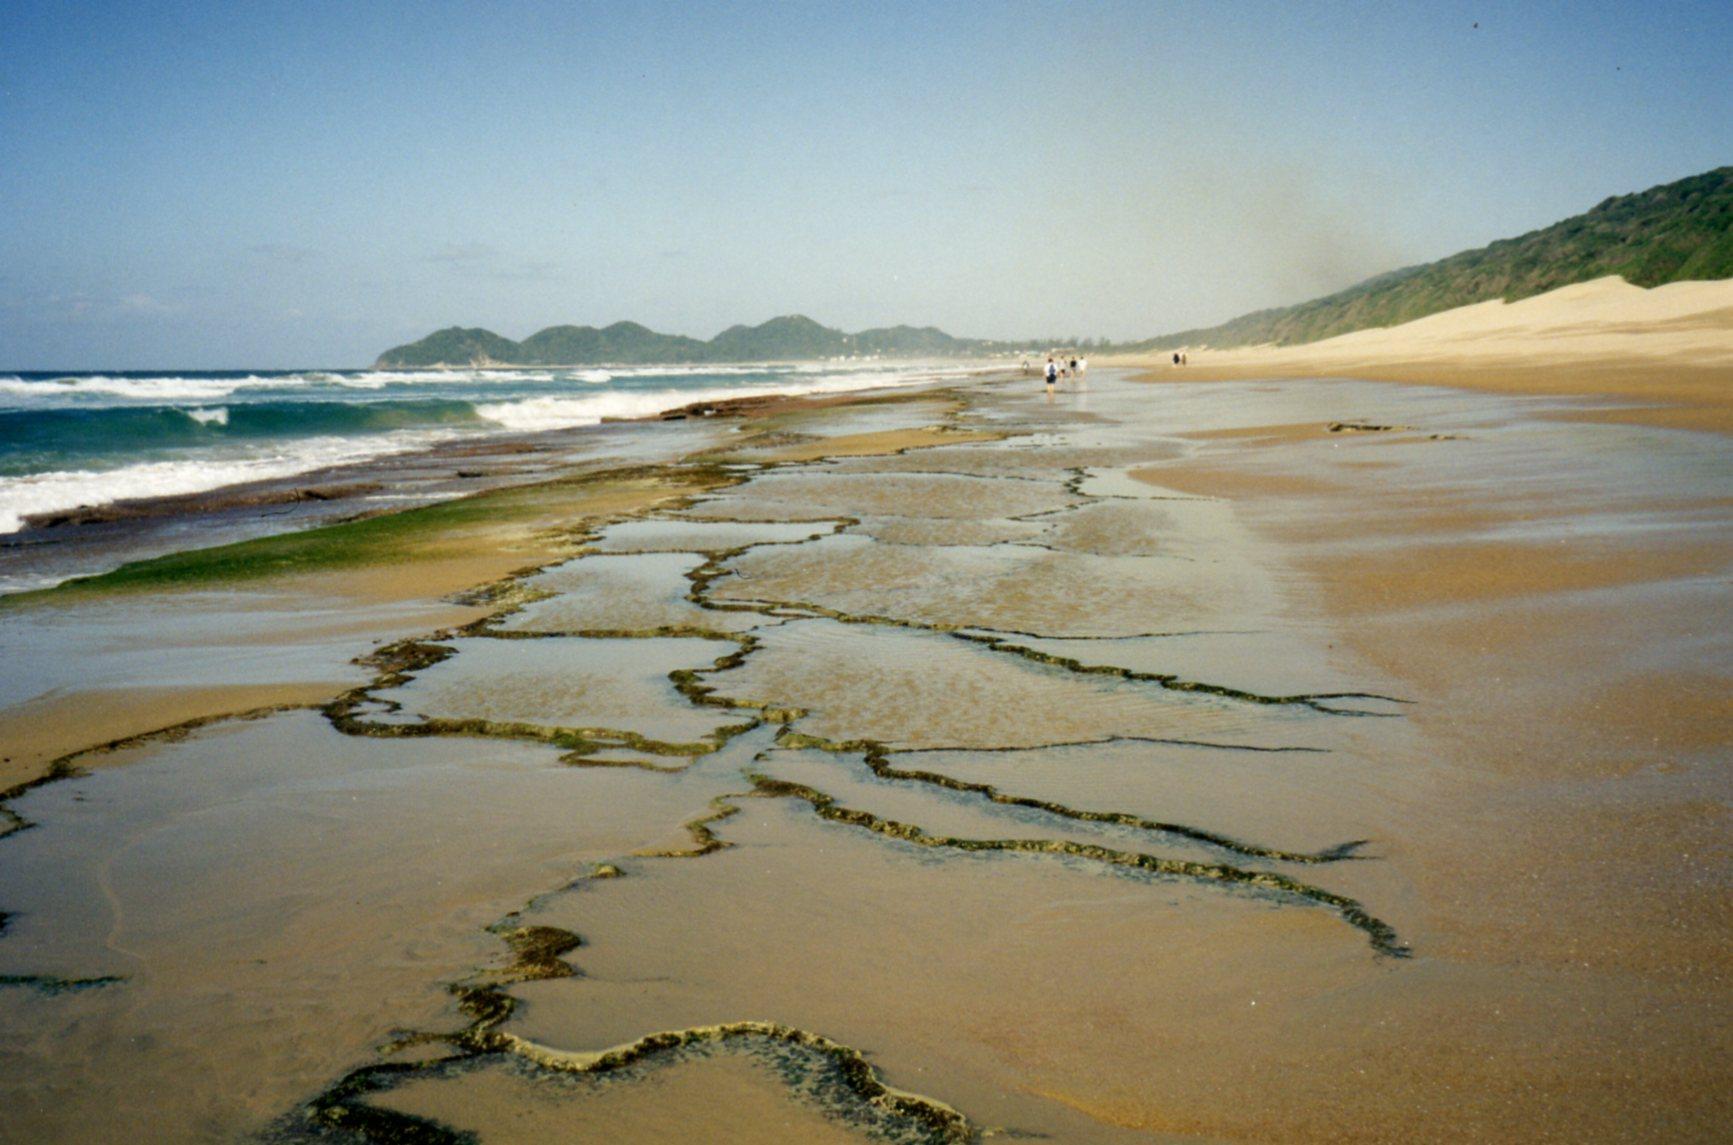 Rocks sticking through the sand